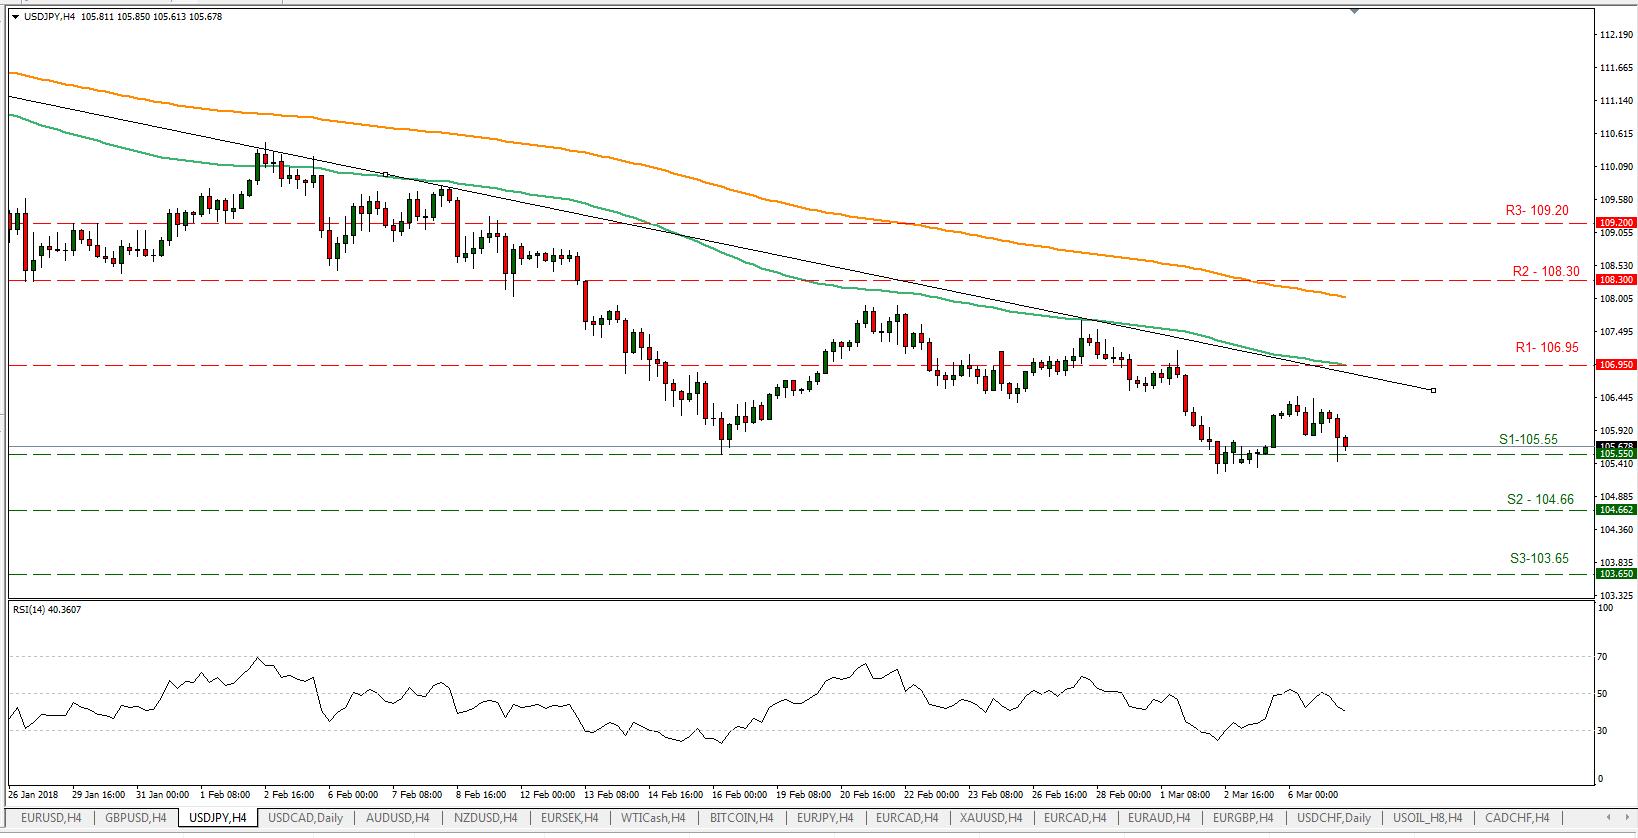 USD/JPY 07/03/2018 | EconAlerts